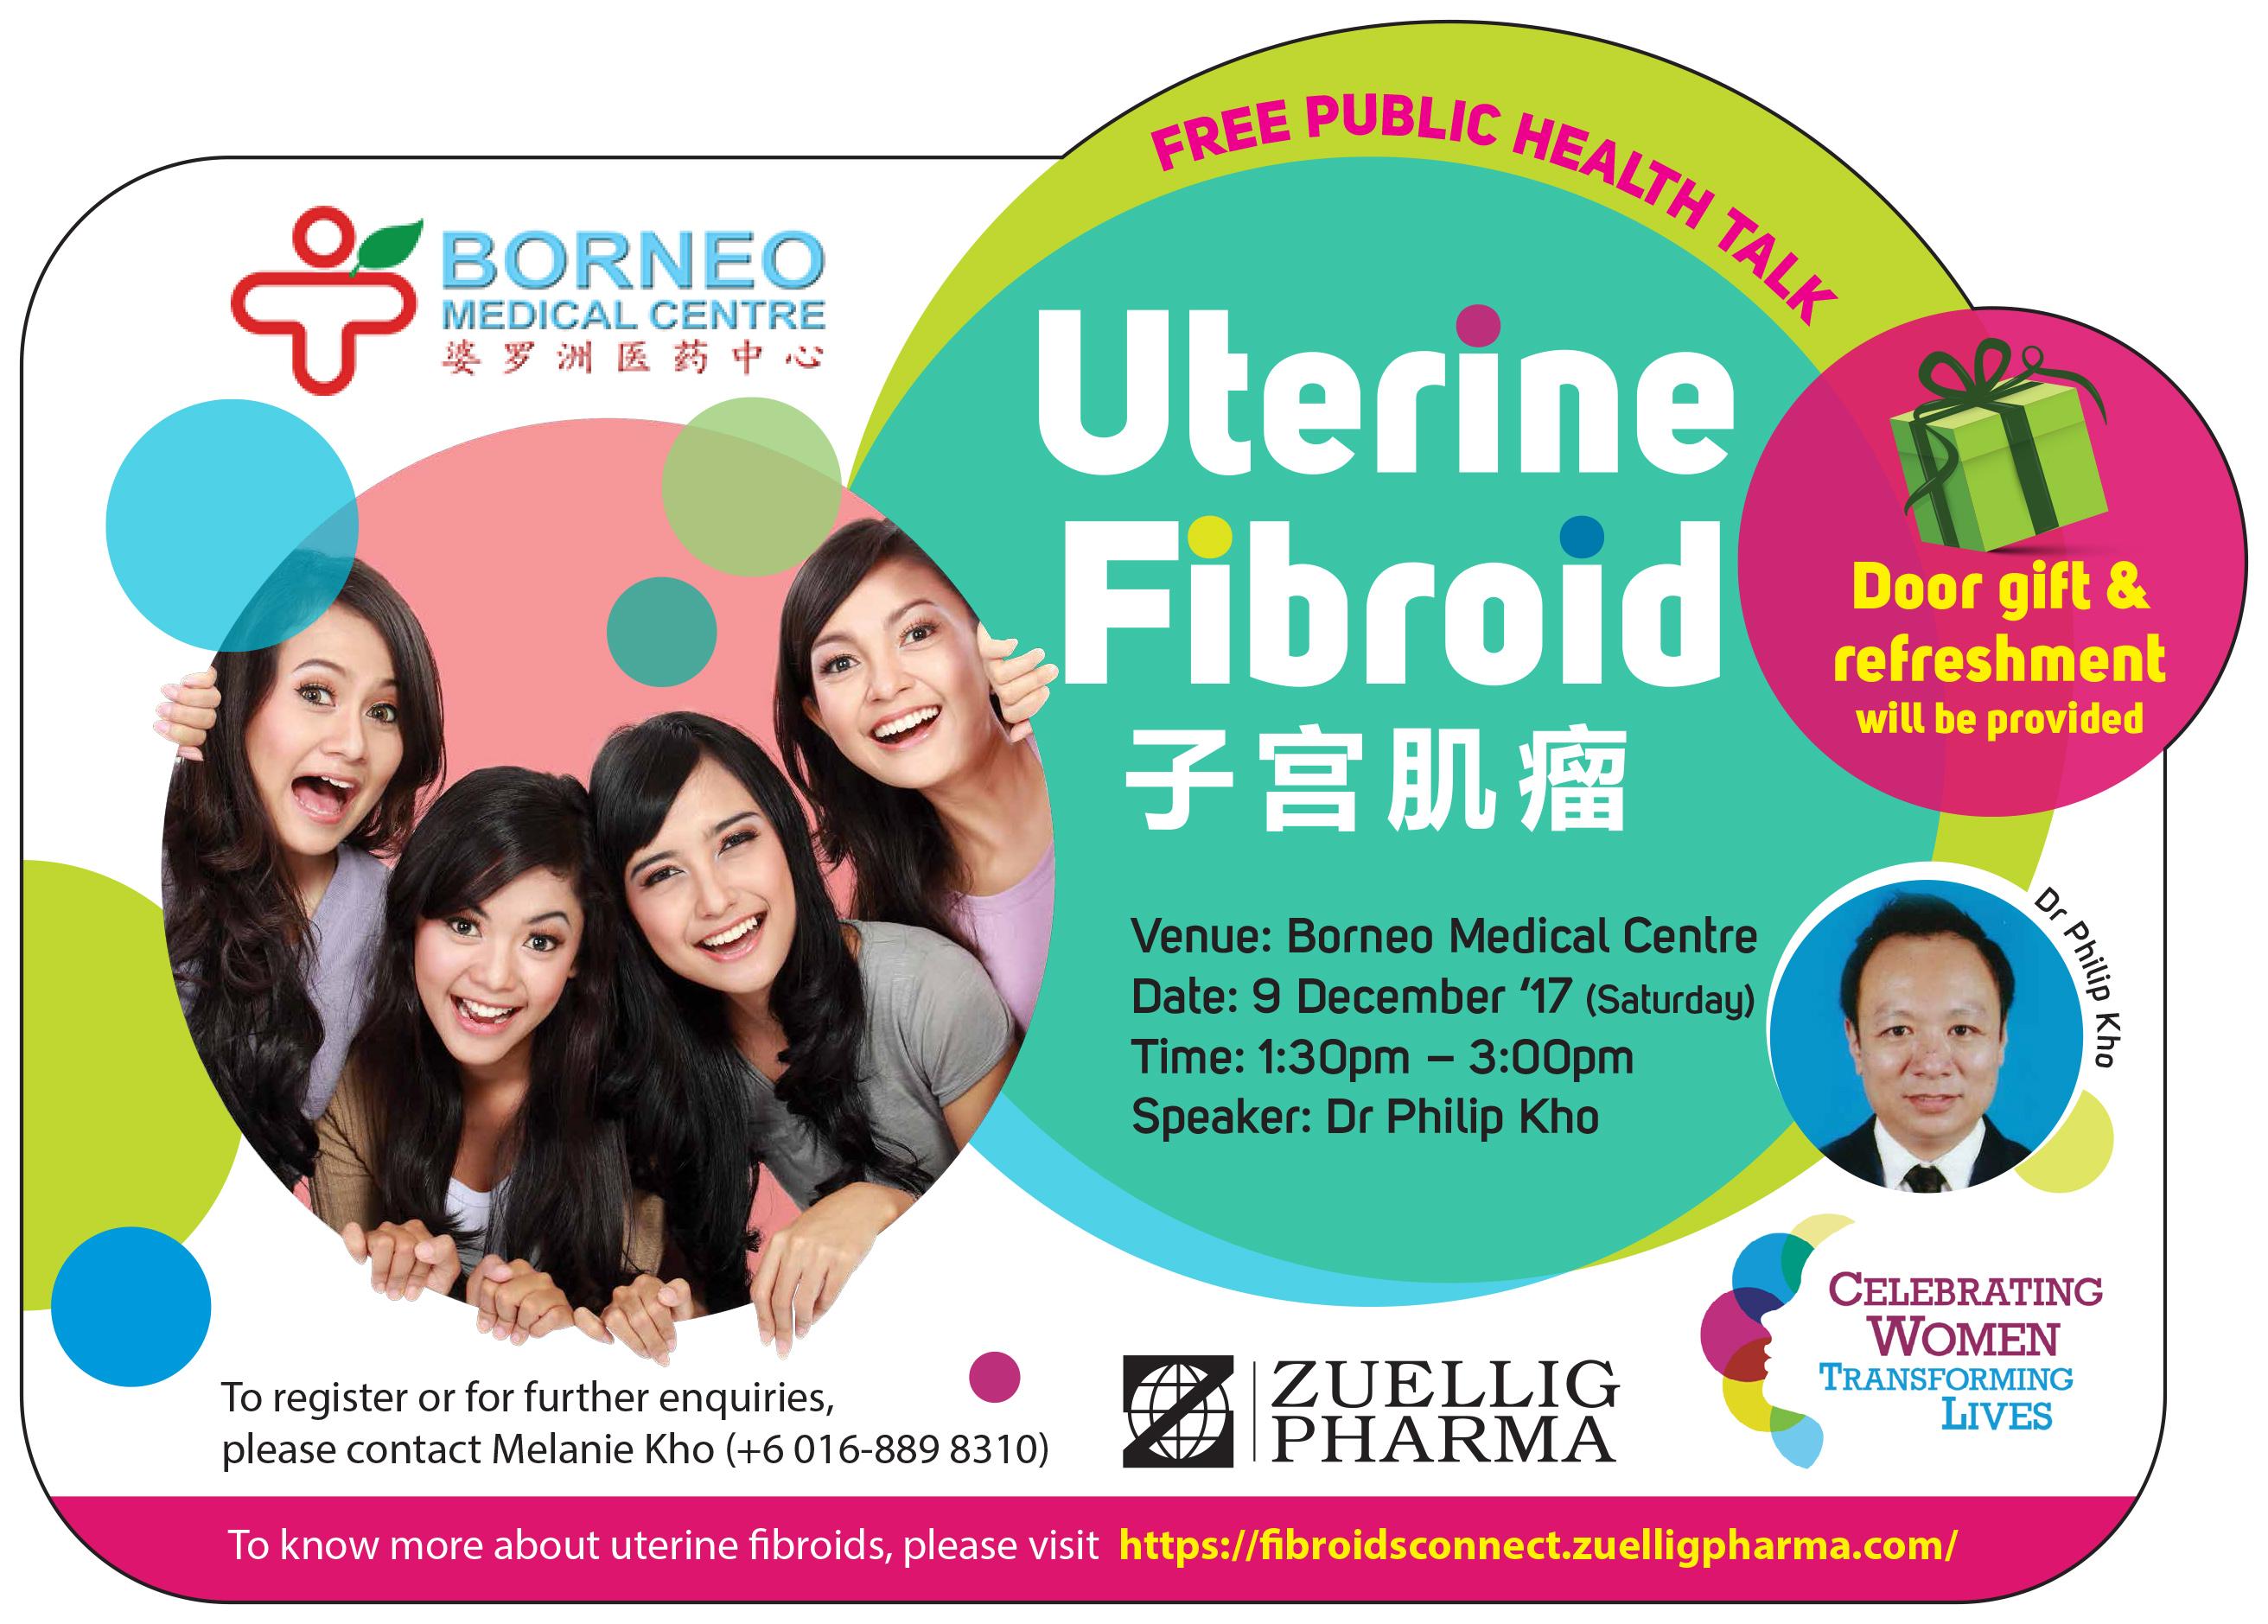 Uterine Fibroid 子宫肌瘤 Public Health Talk